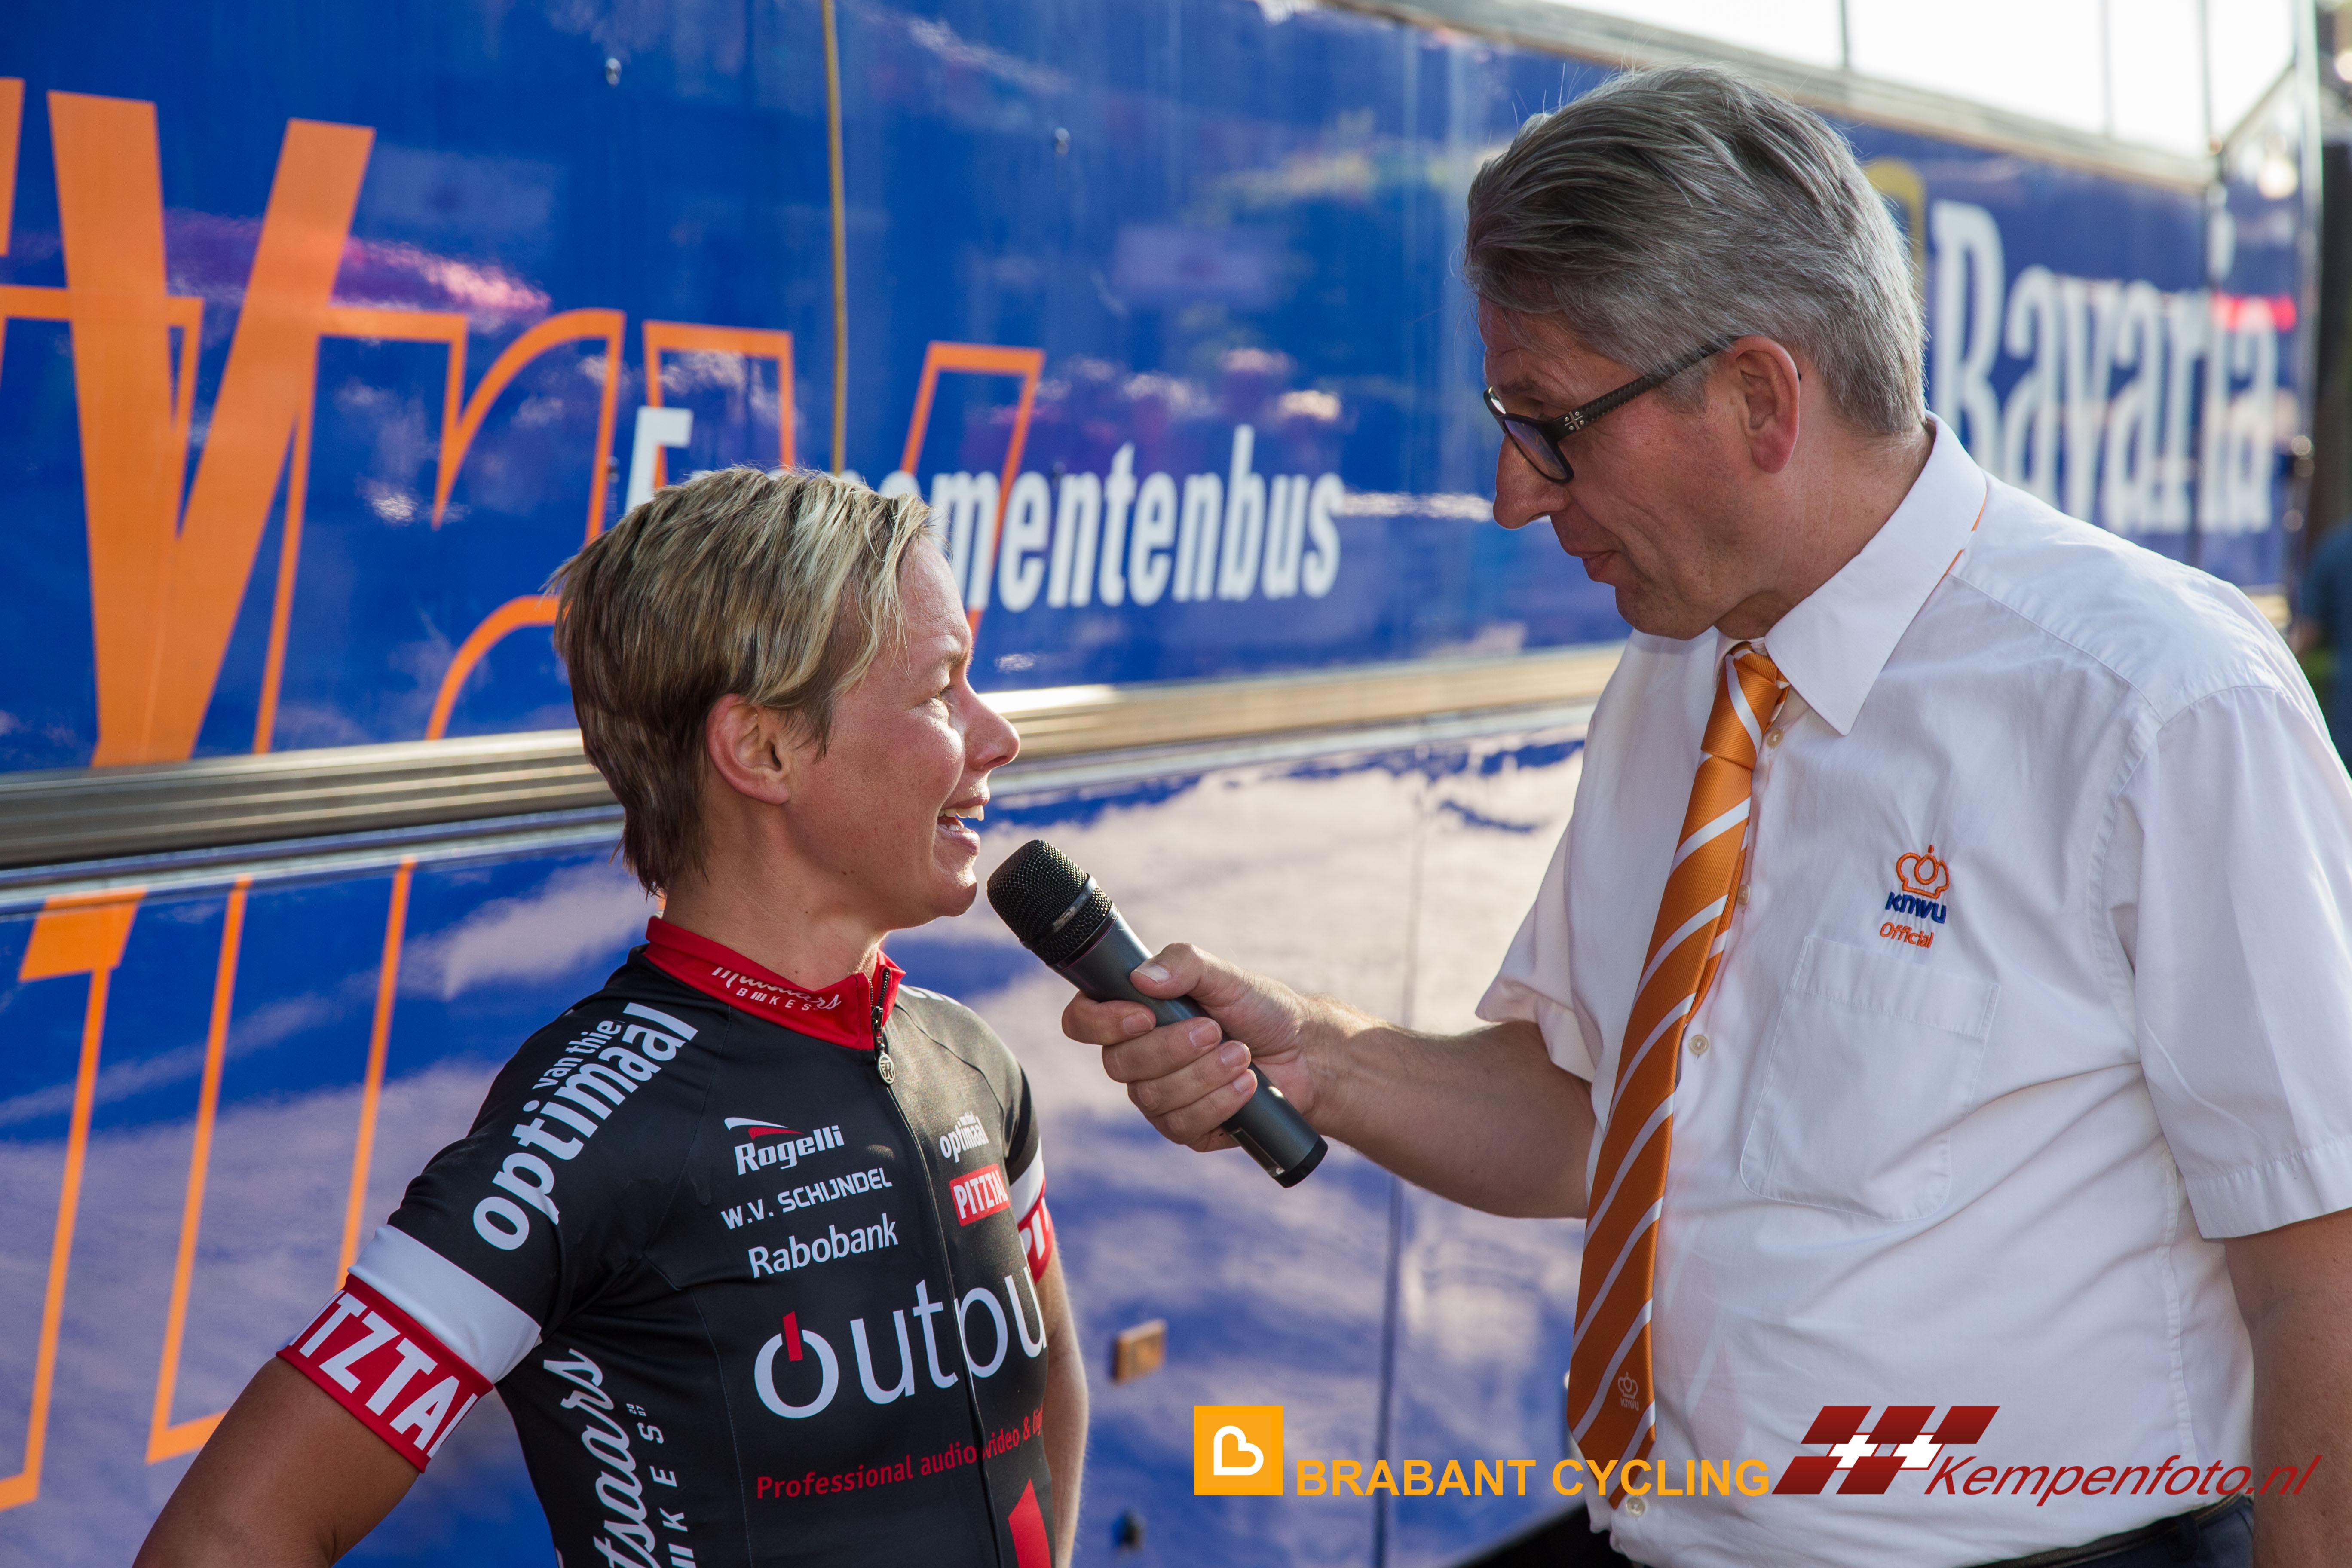 Kempenklassement Steensel dames (104)